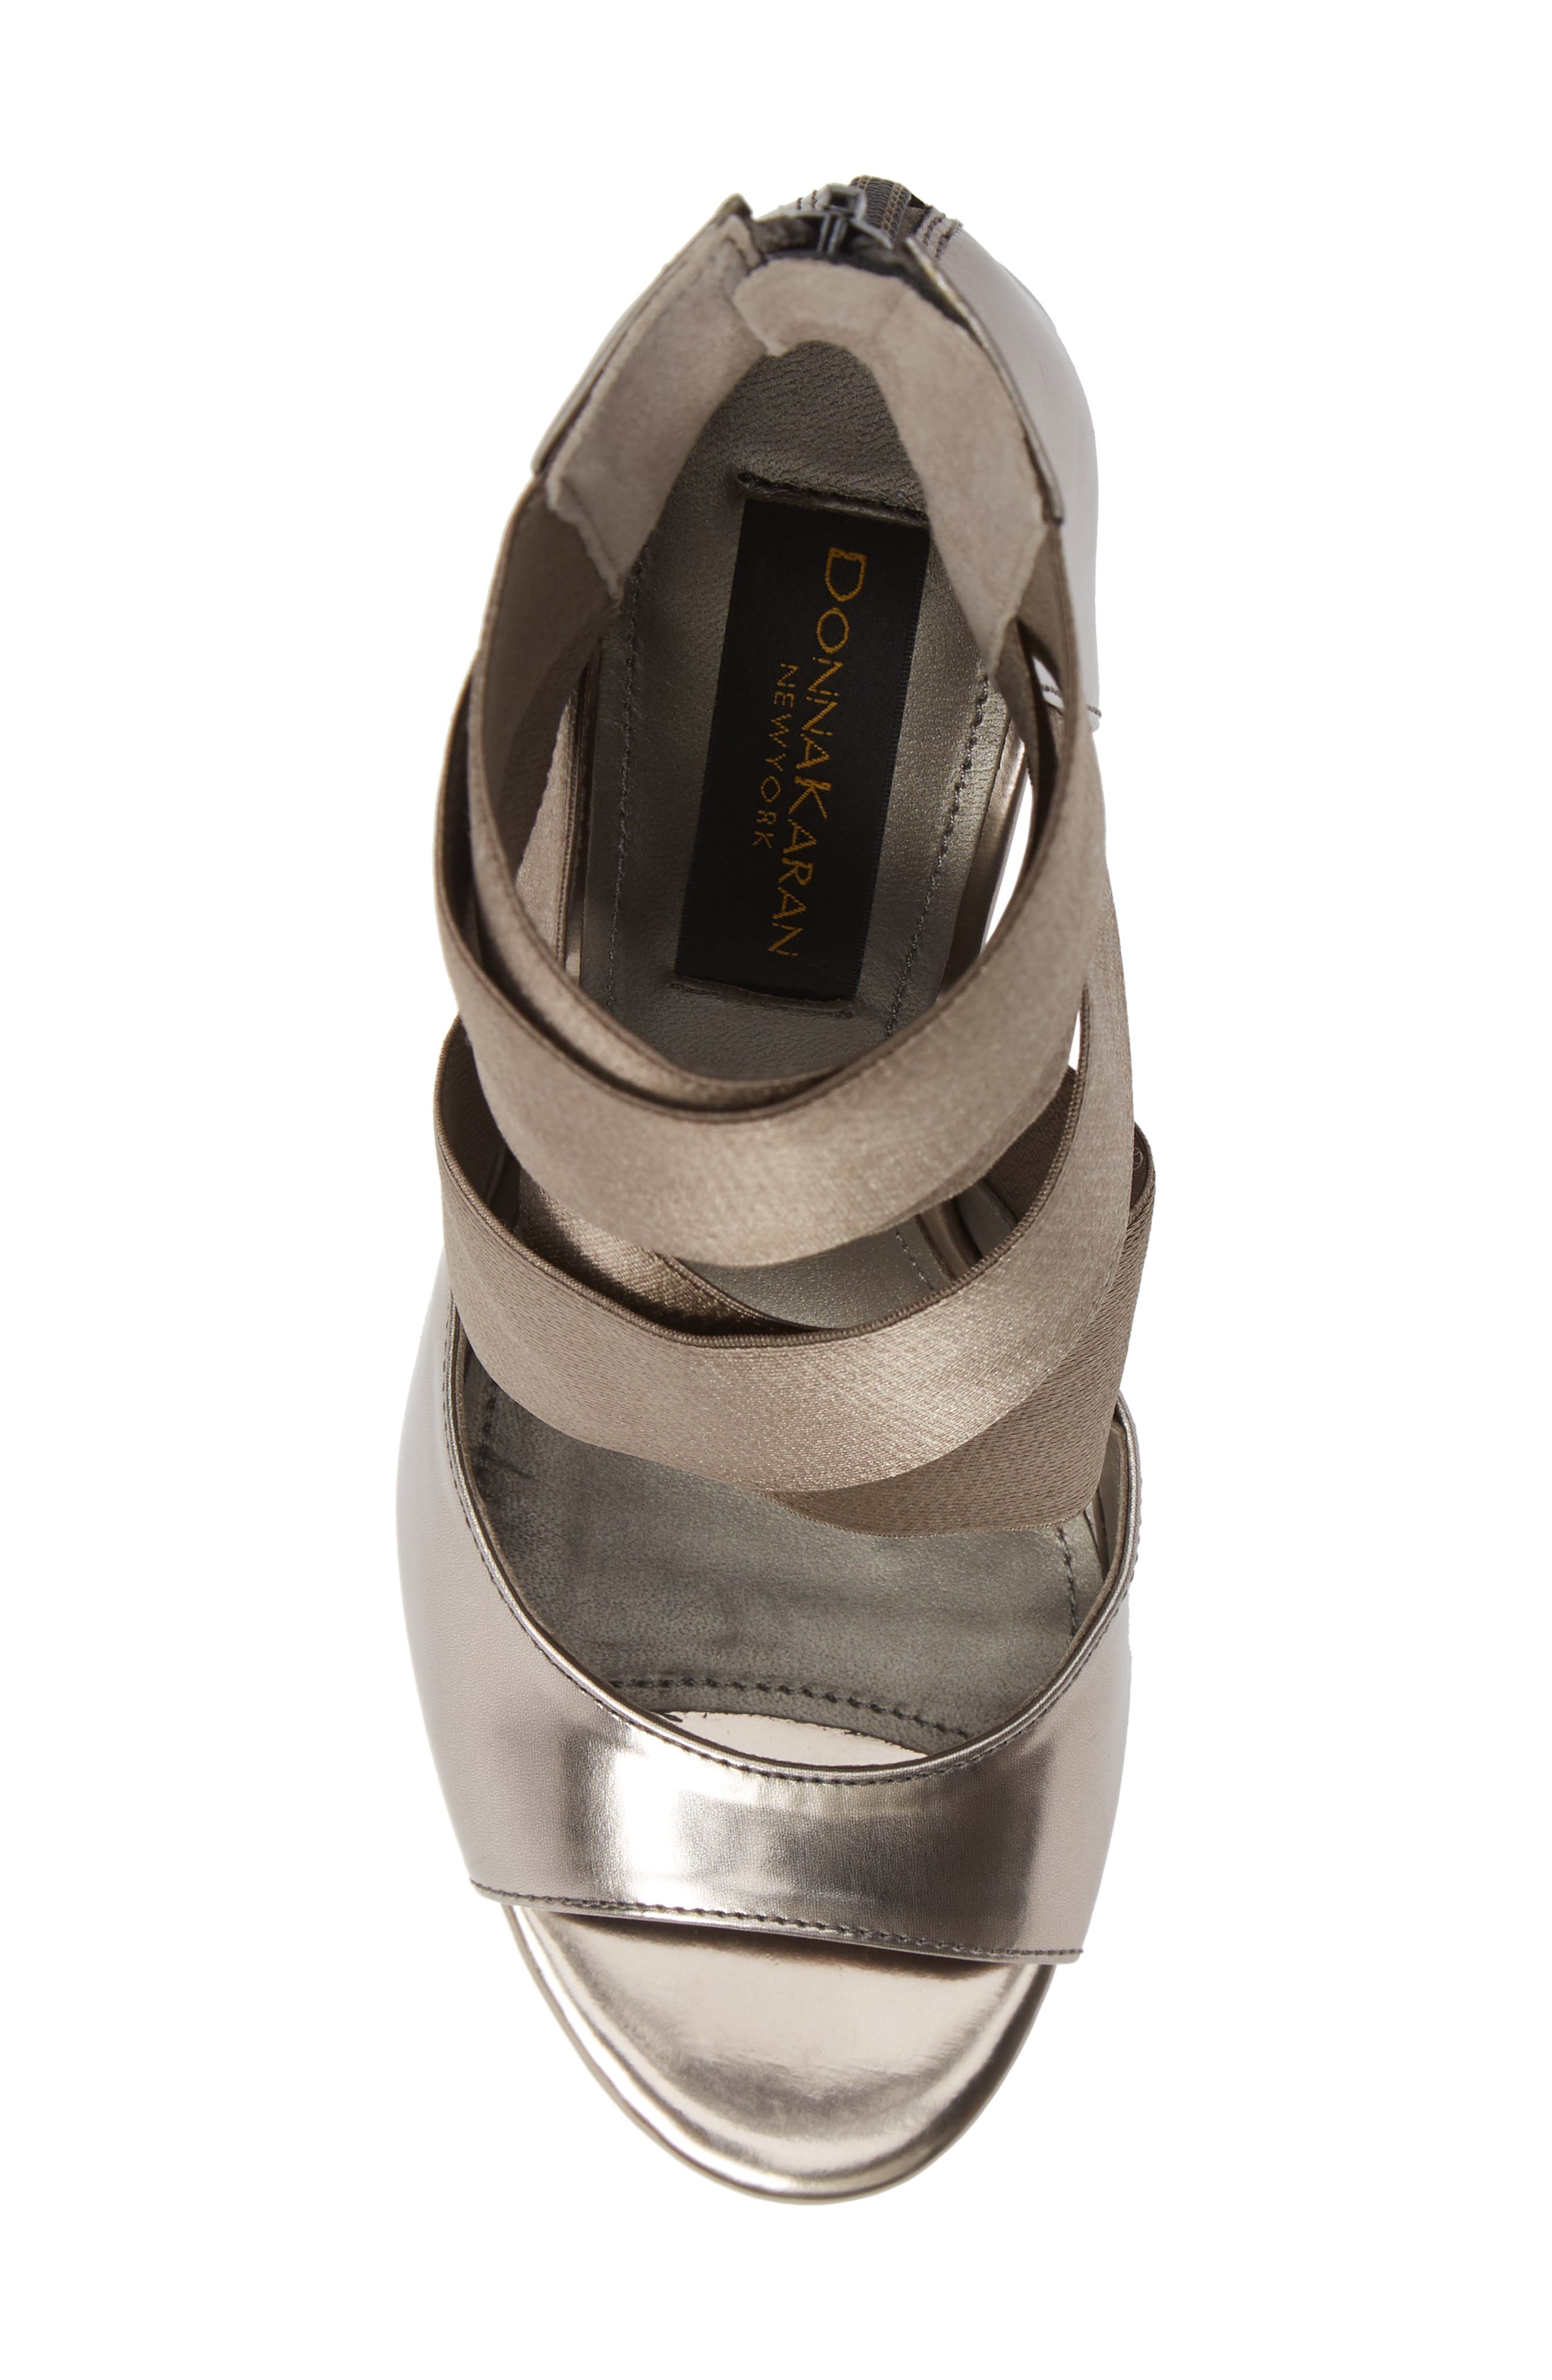 Donna Karan Briana Strappy High Sandal,                             Alternate thumbnail 5, color,                             DARK PEWTER